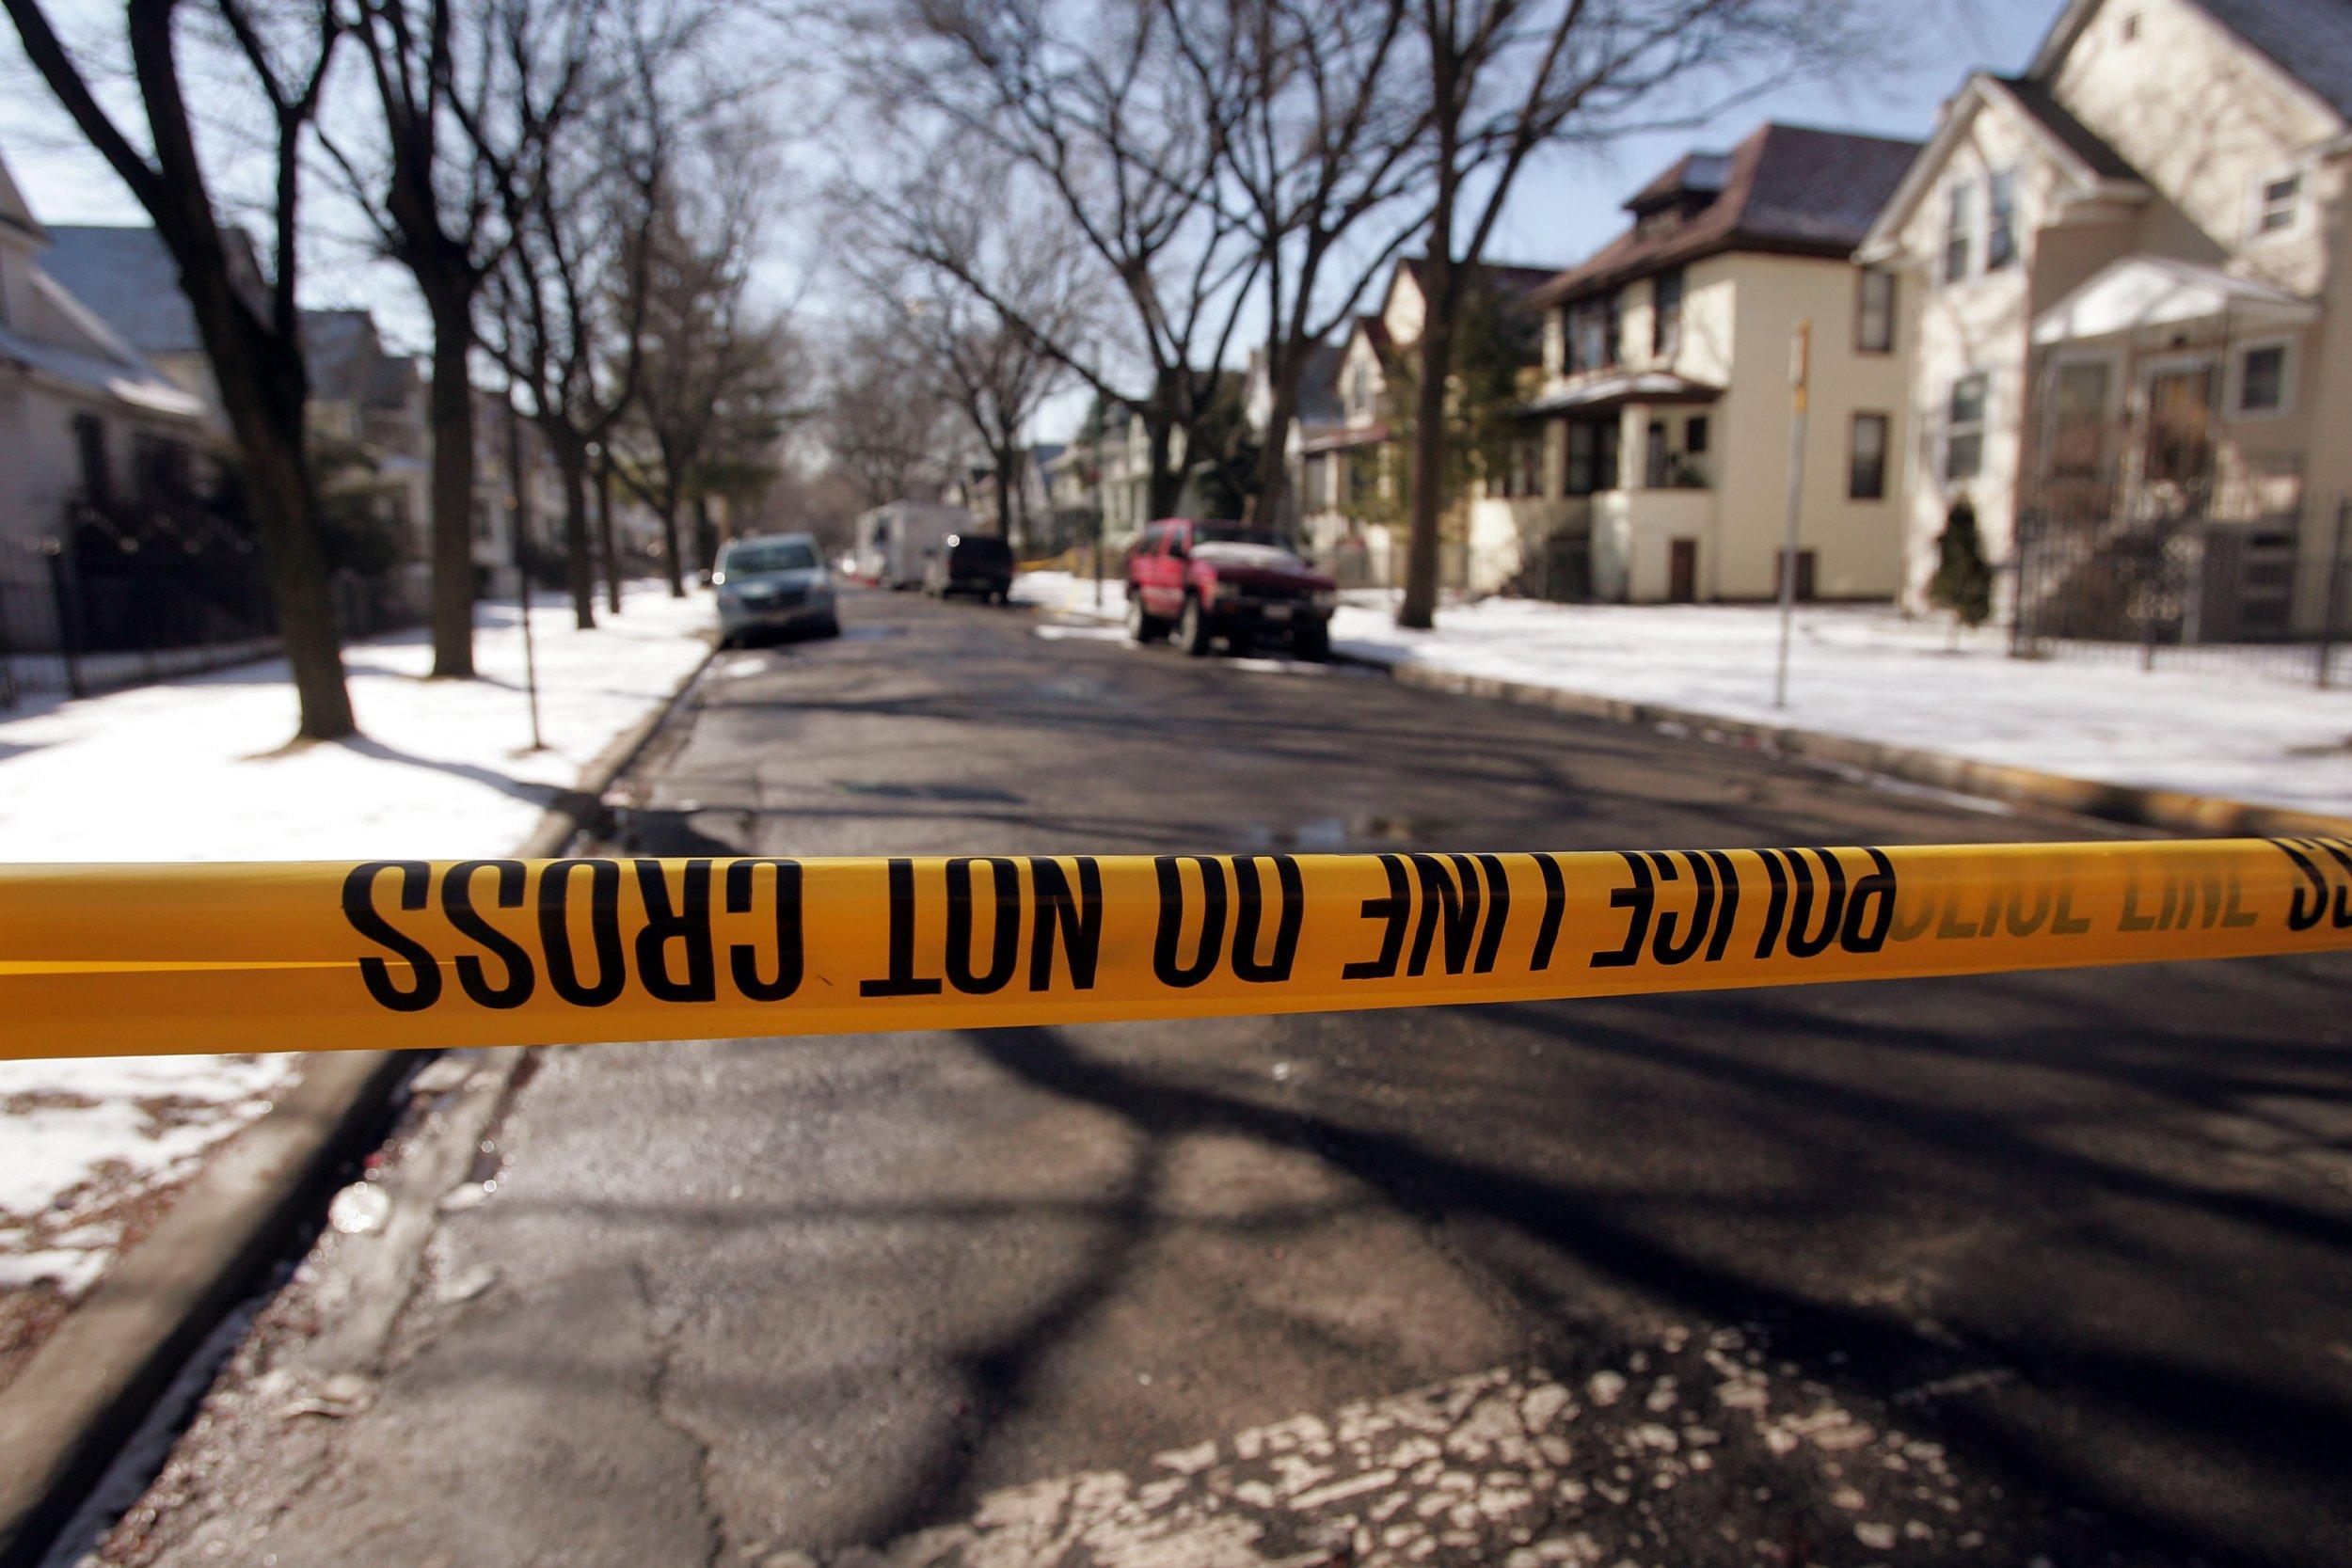 Chicago teen Kenneka Jenkins found dead in hotel freezer